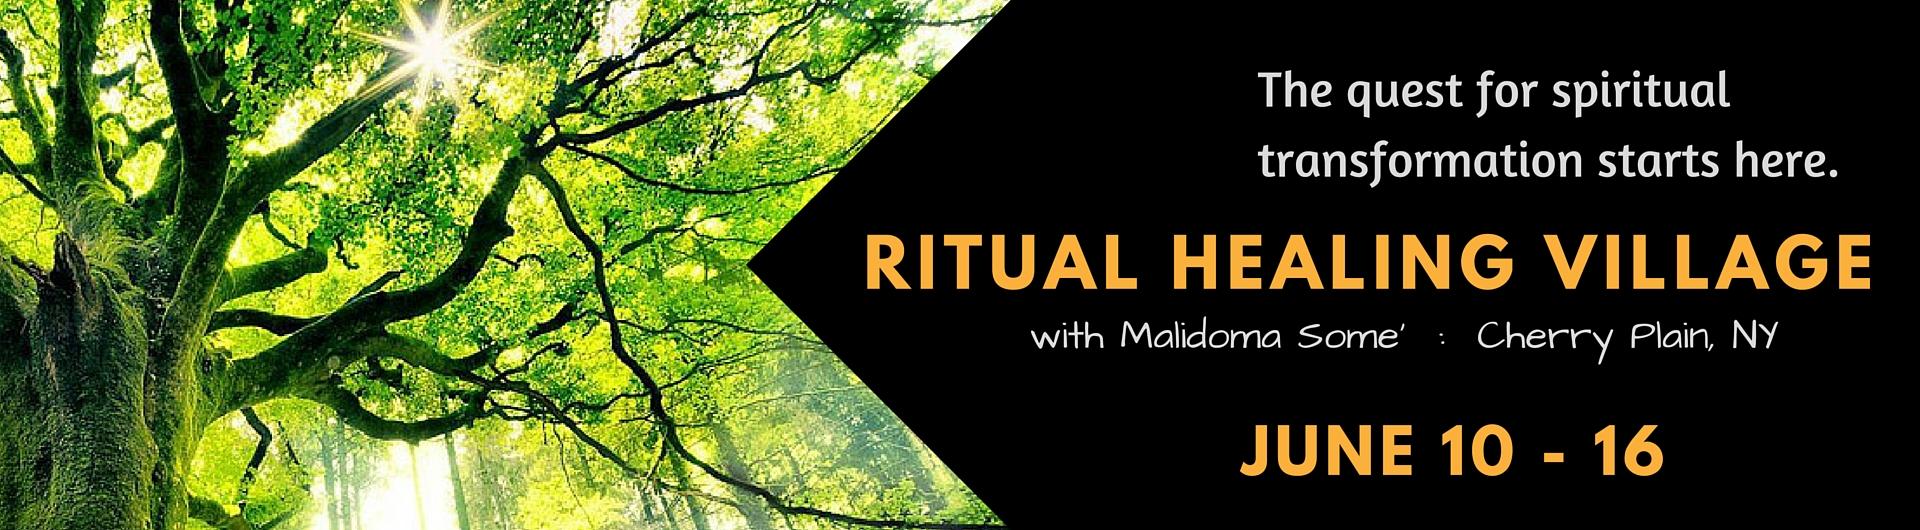 Ritual Healing Village, June 10-16